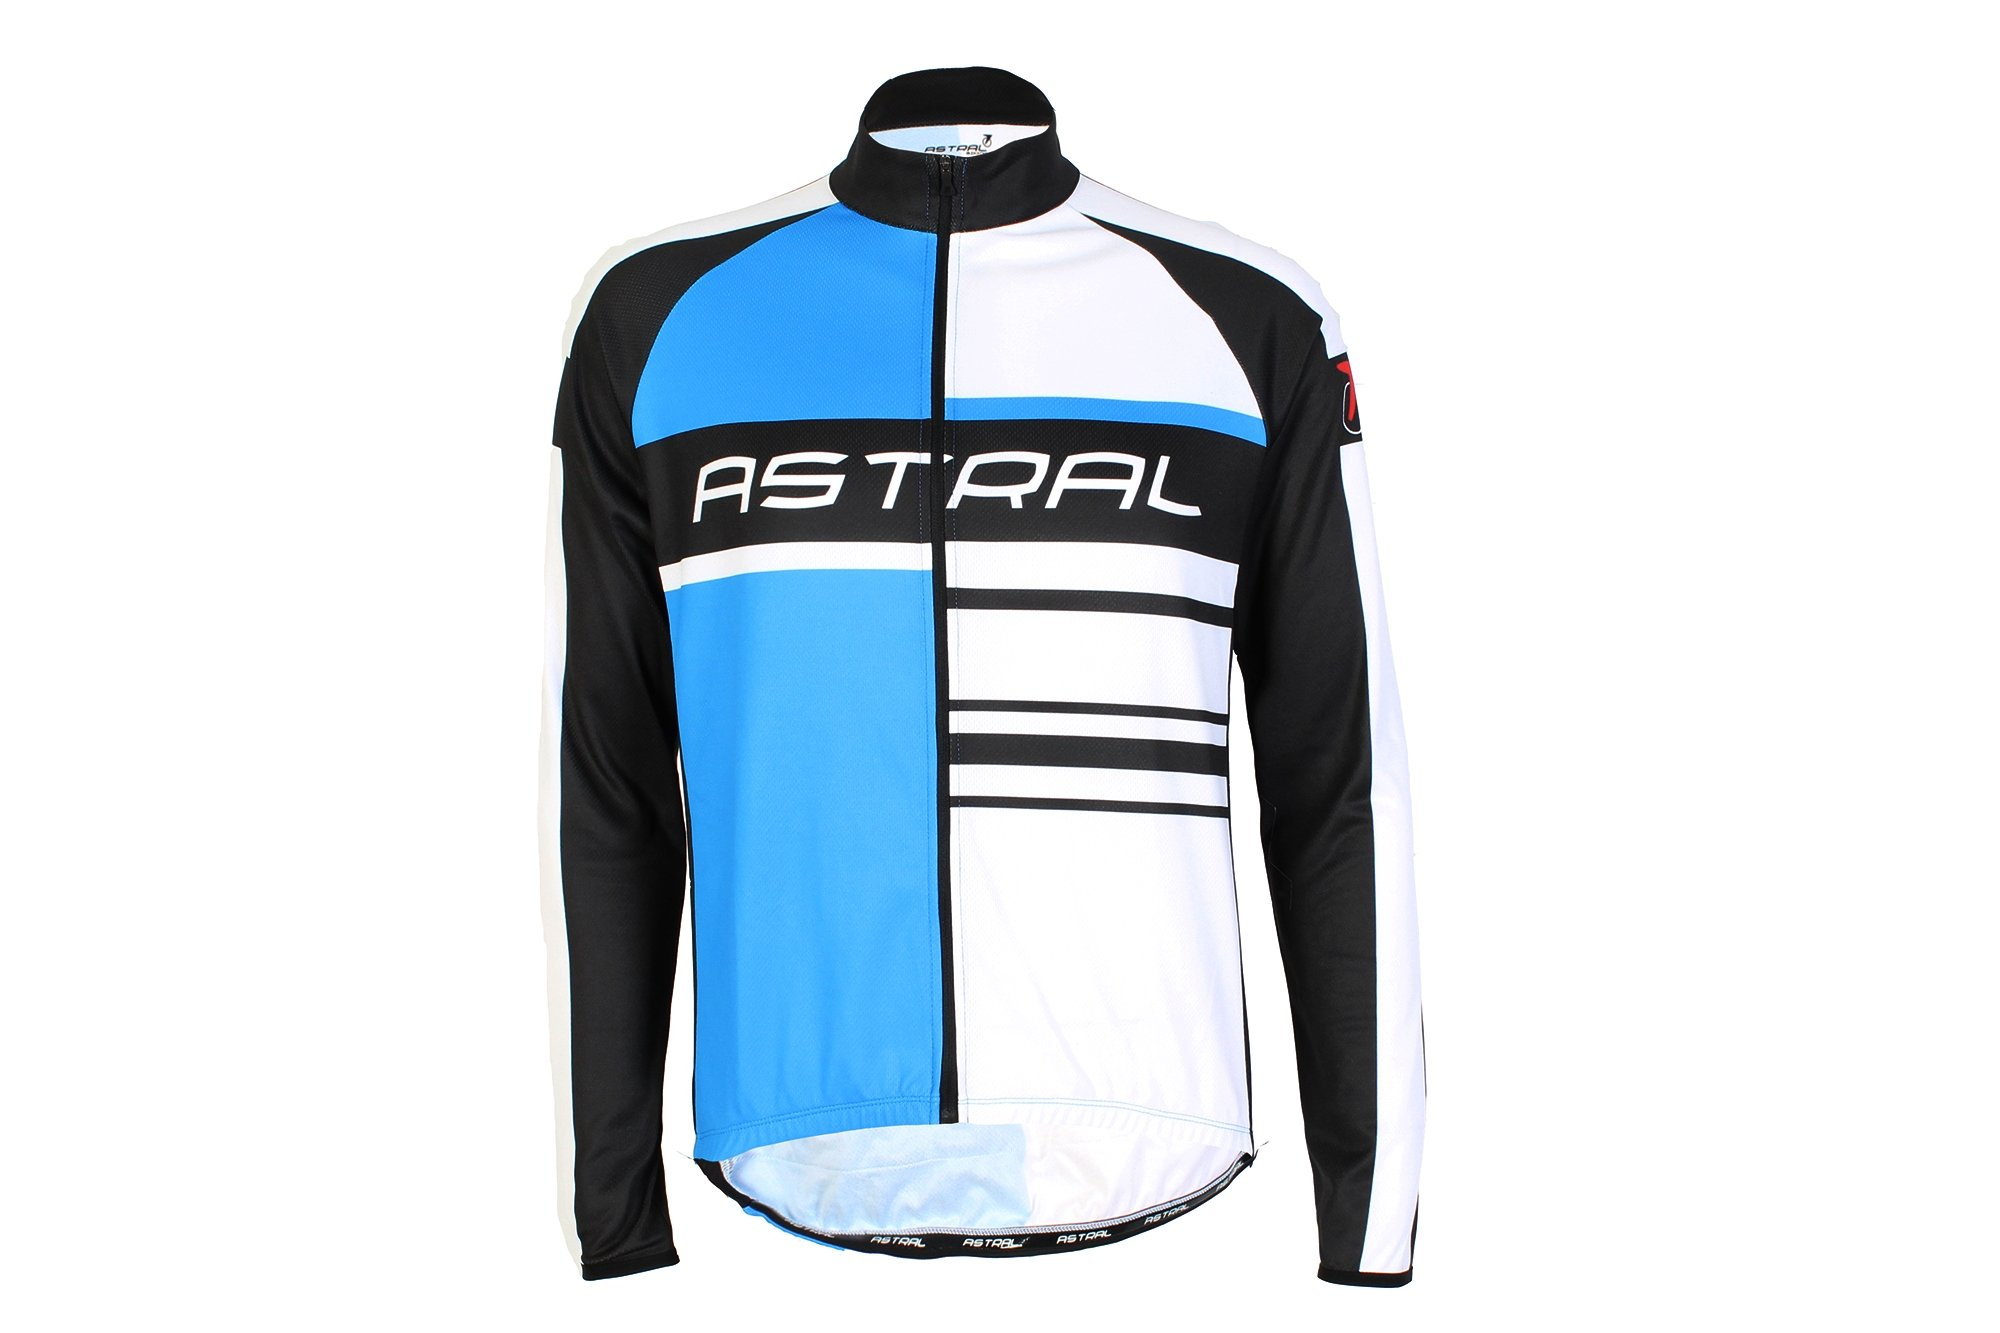 astral - langærmet cykeltrøje